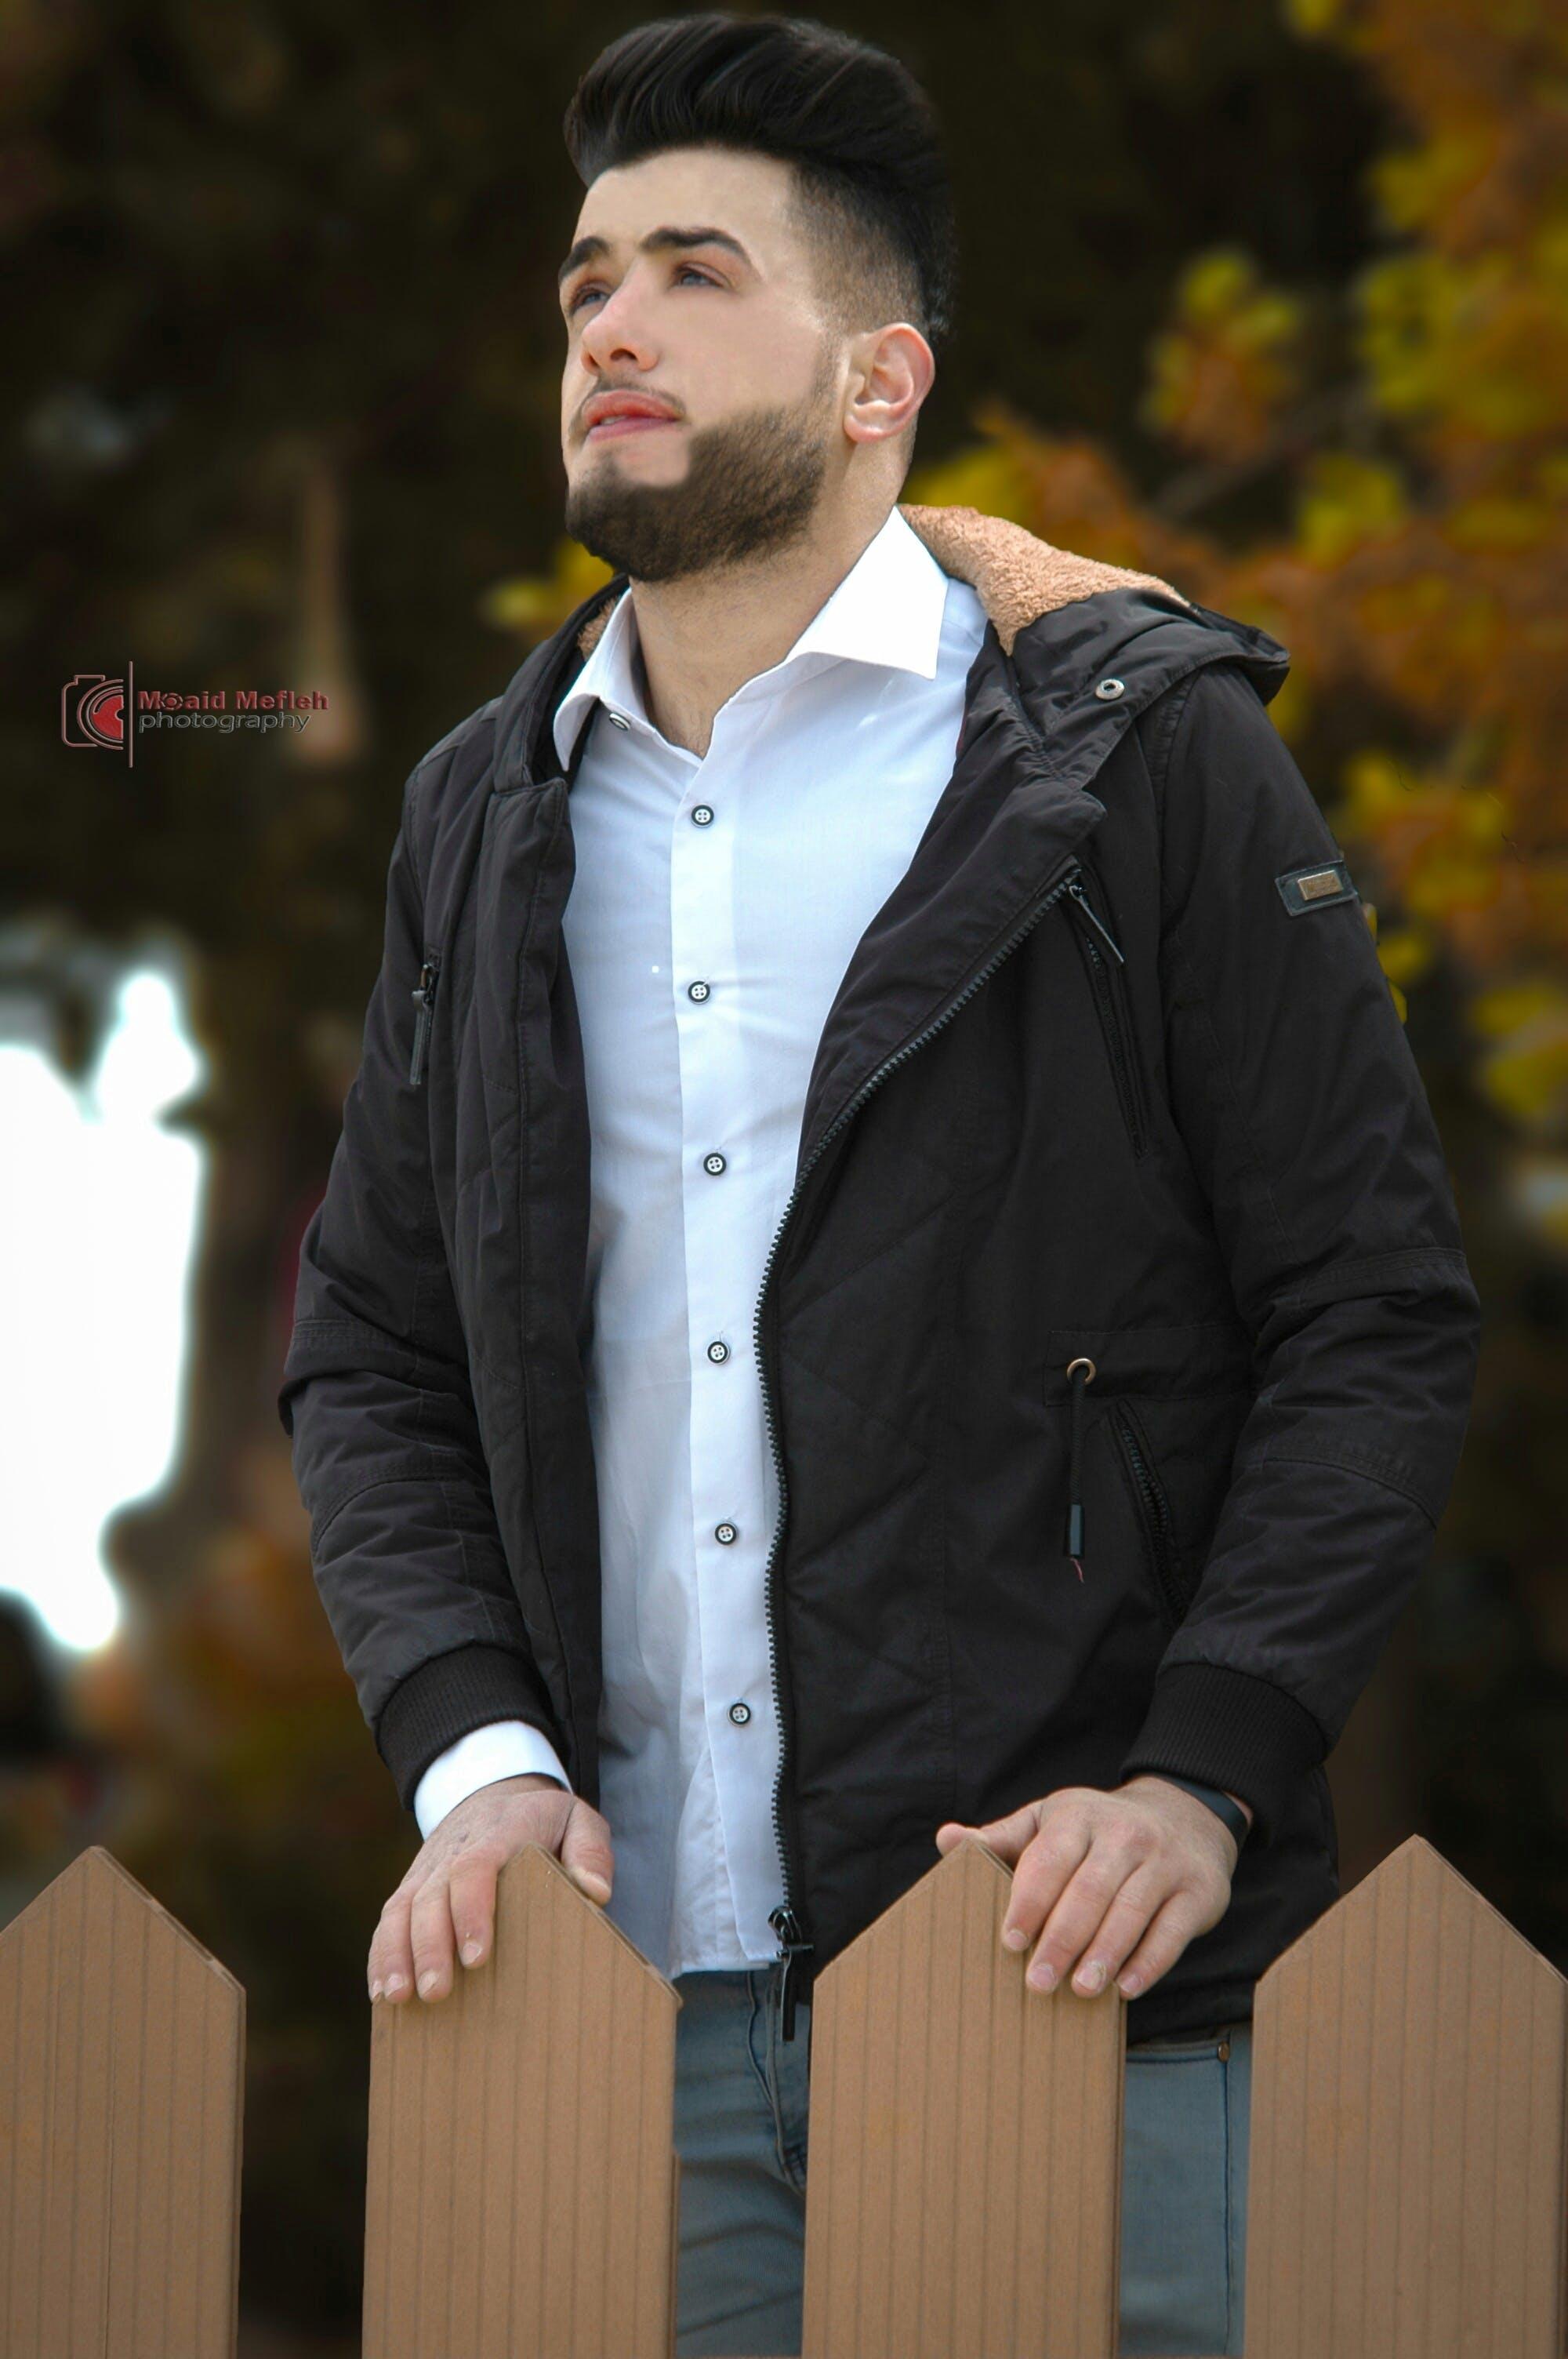 Kostenloses Stock Foto zu fotografie, moaid mefleh, porträt